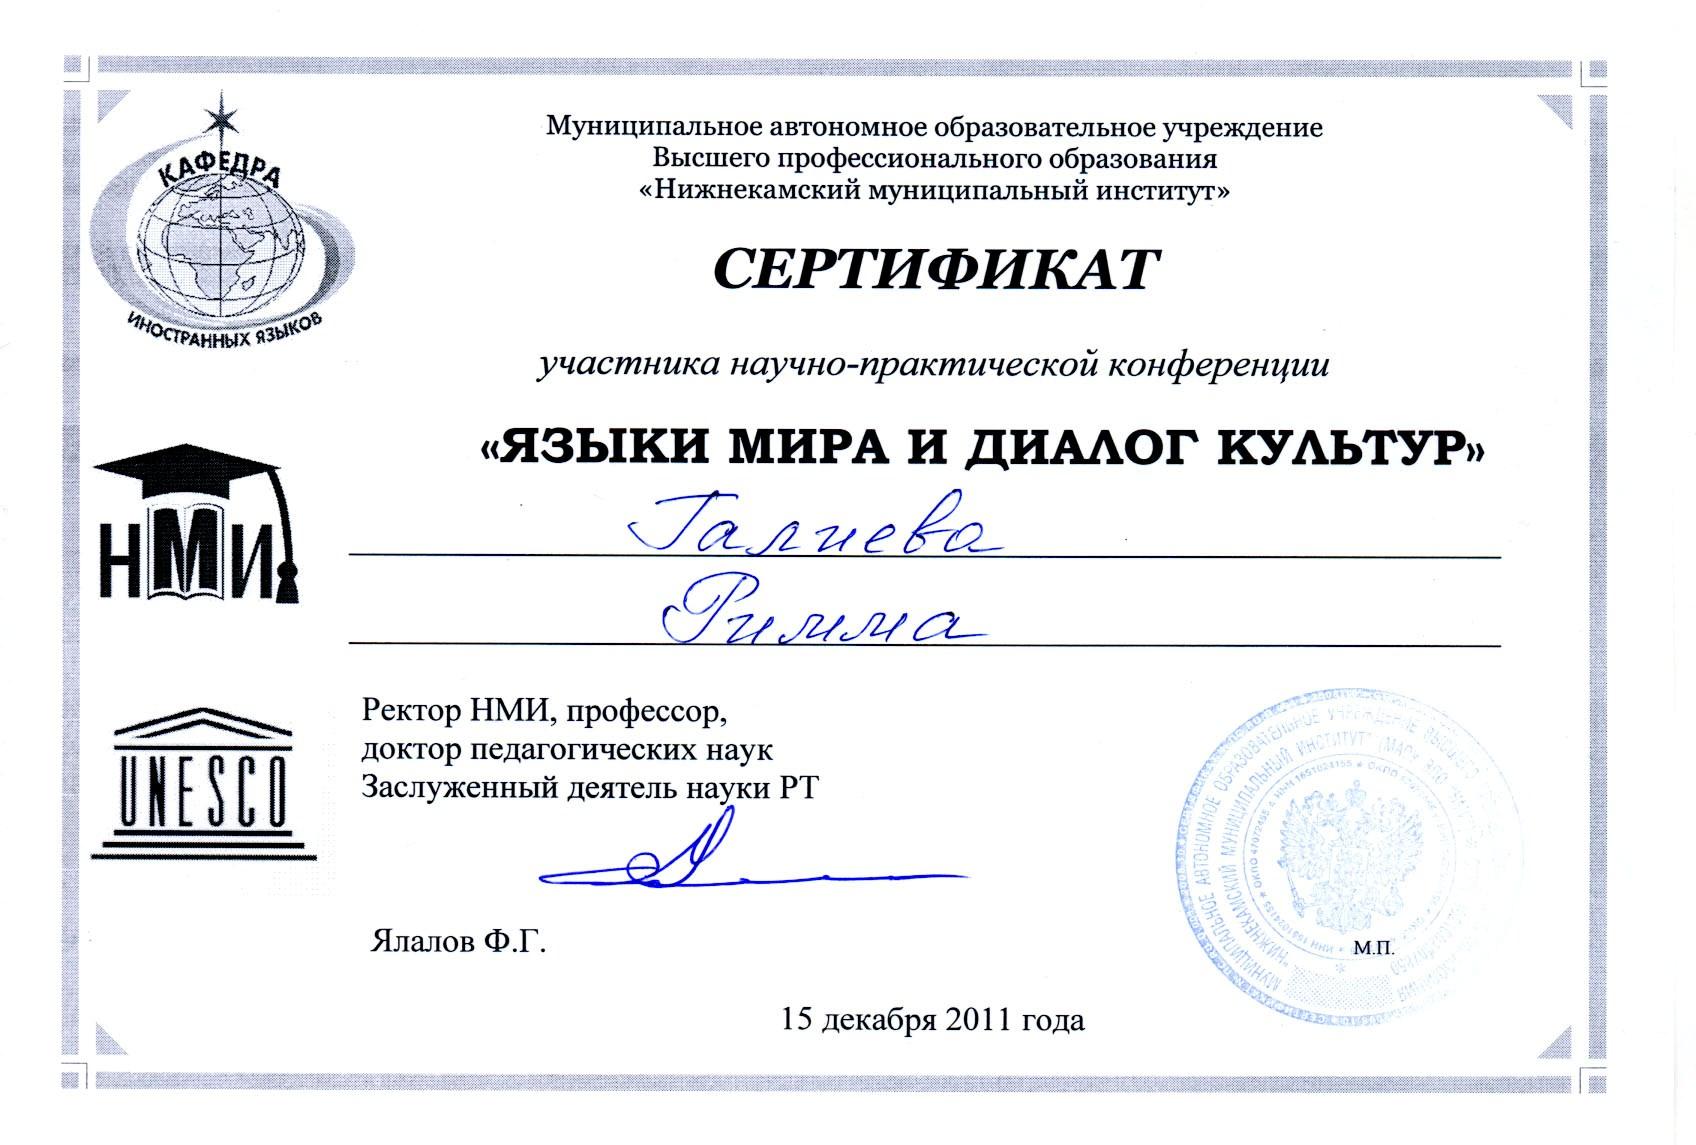 F:\Всероссйский конкурс Портфолио выпускника\РИММА\Безимени-1.jpg